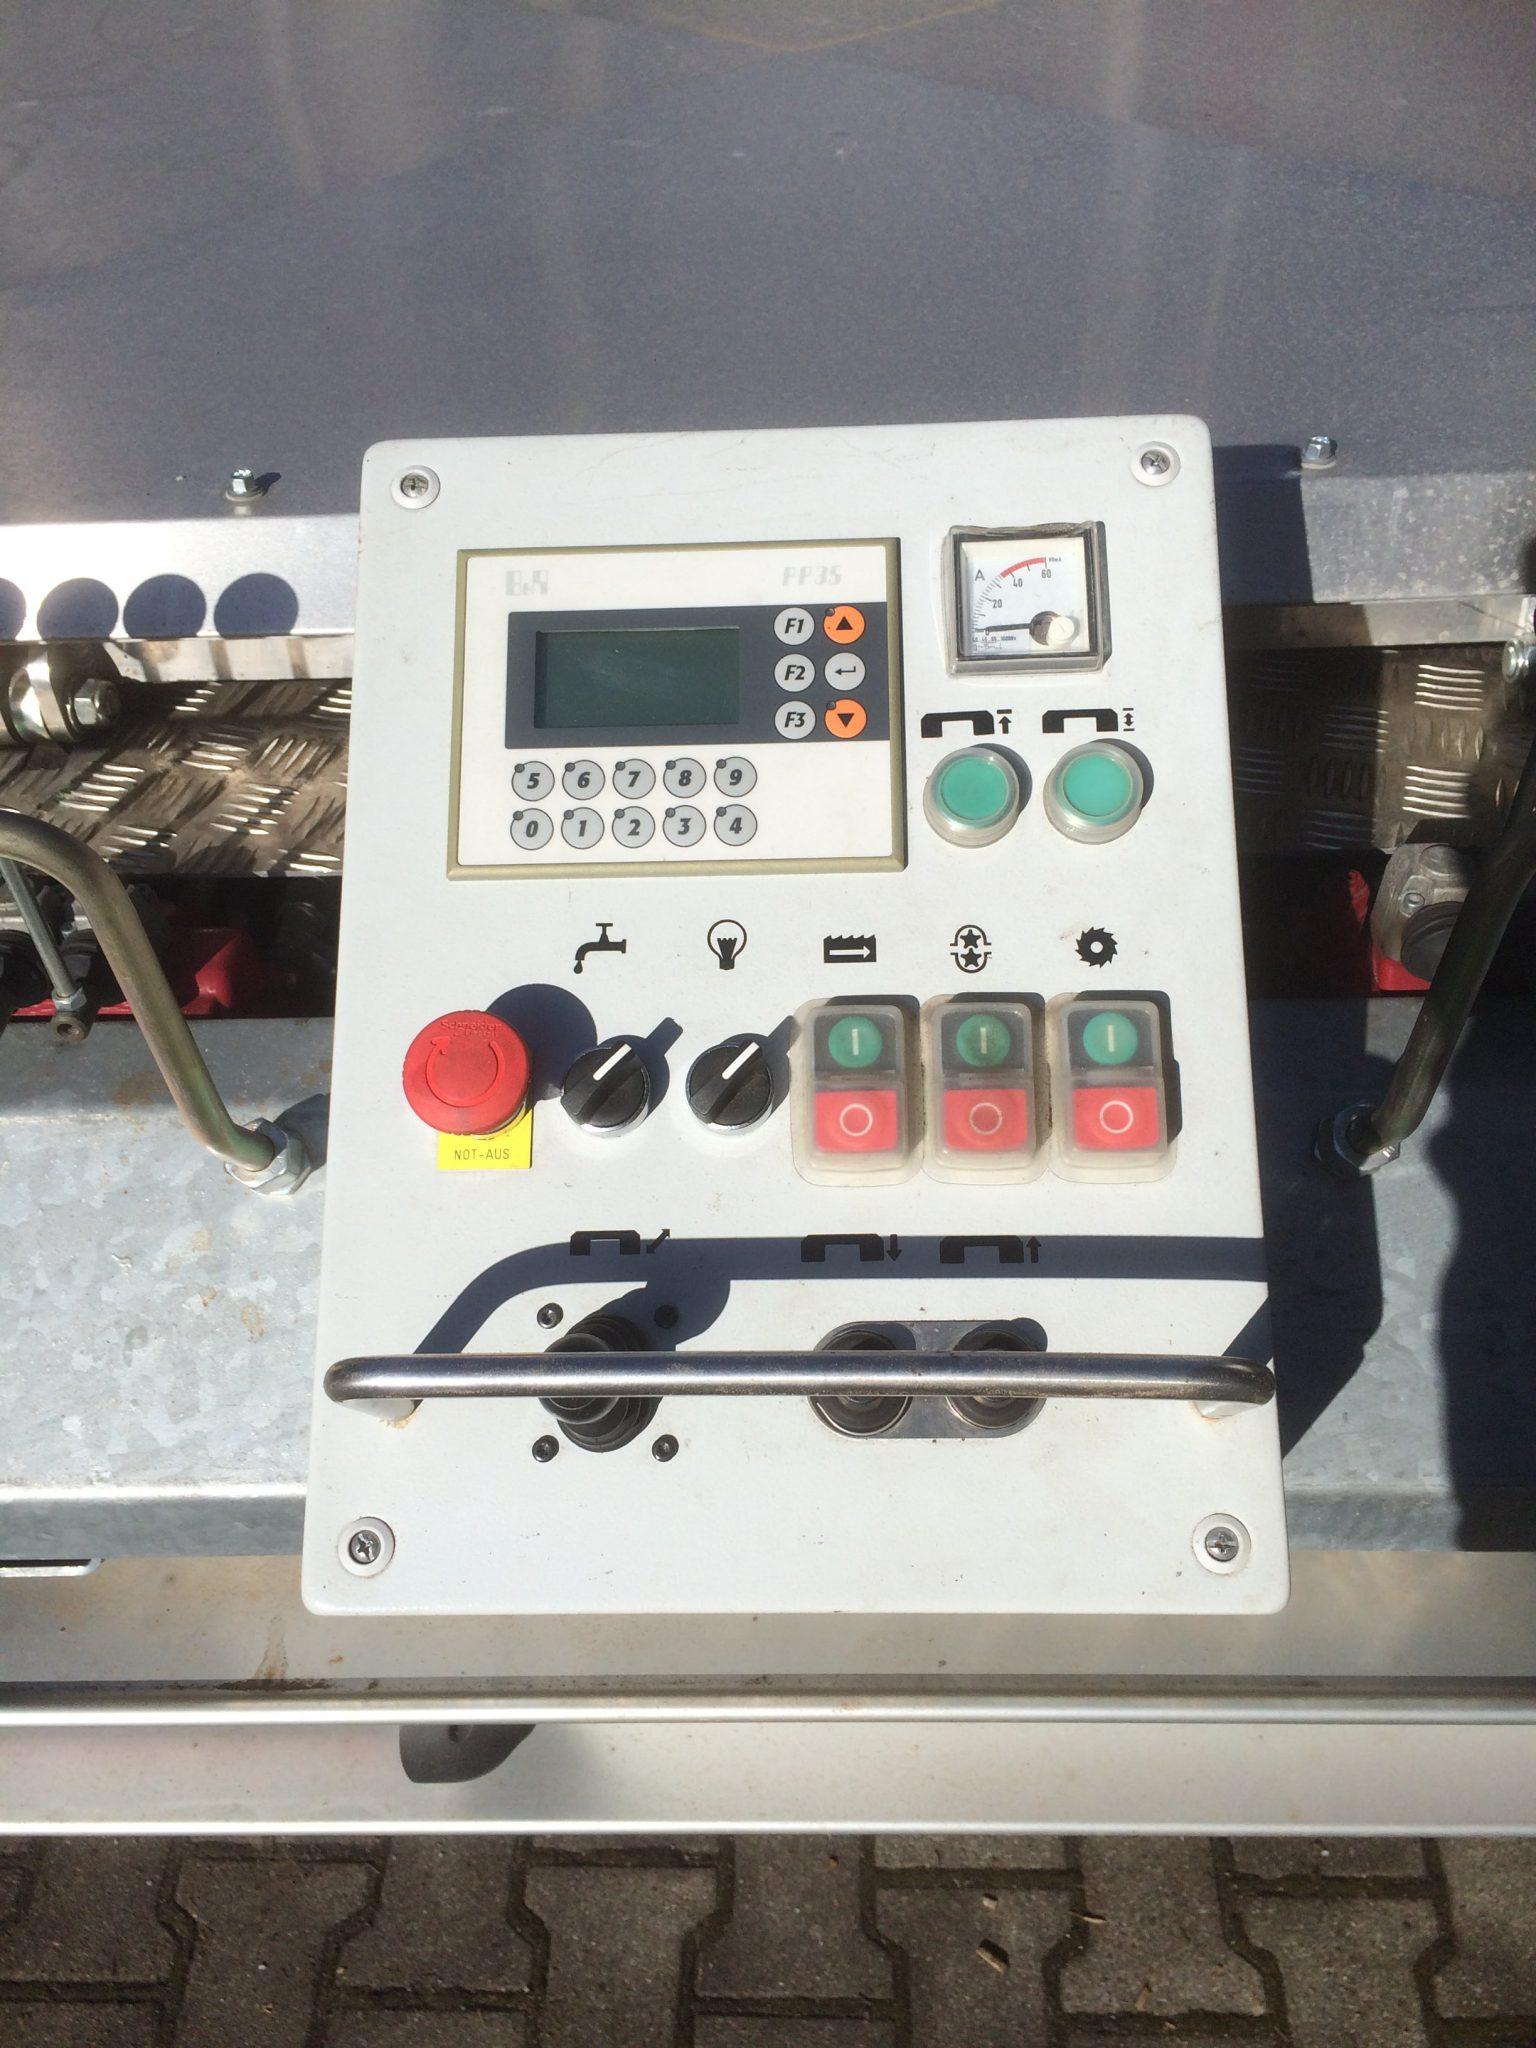 SERRA-POSI-Classic Computerized controls